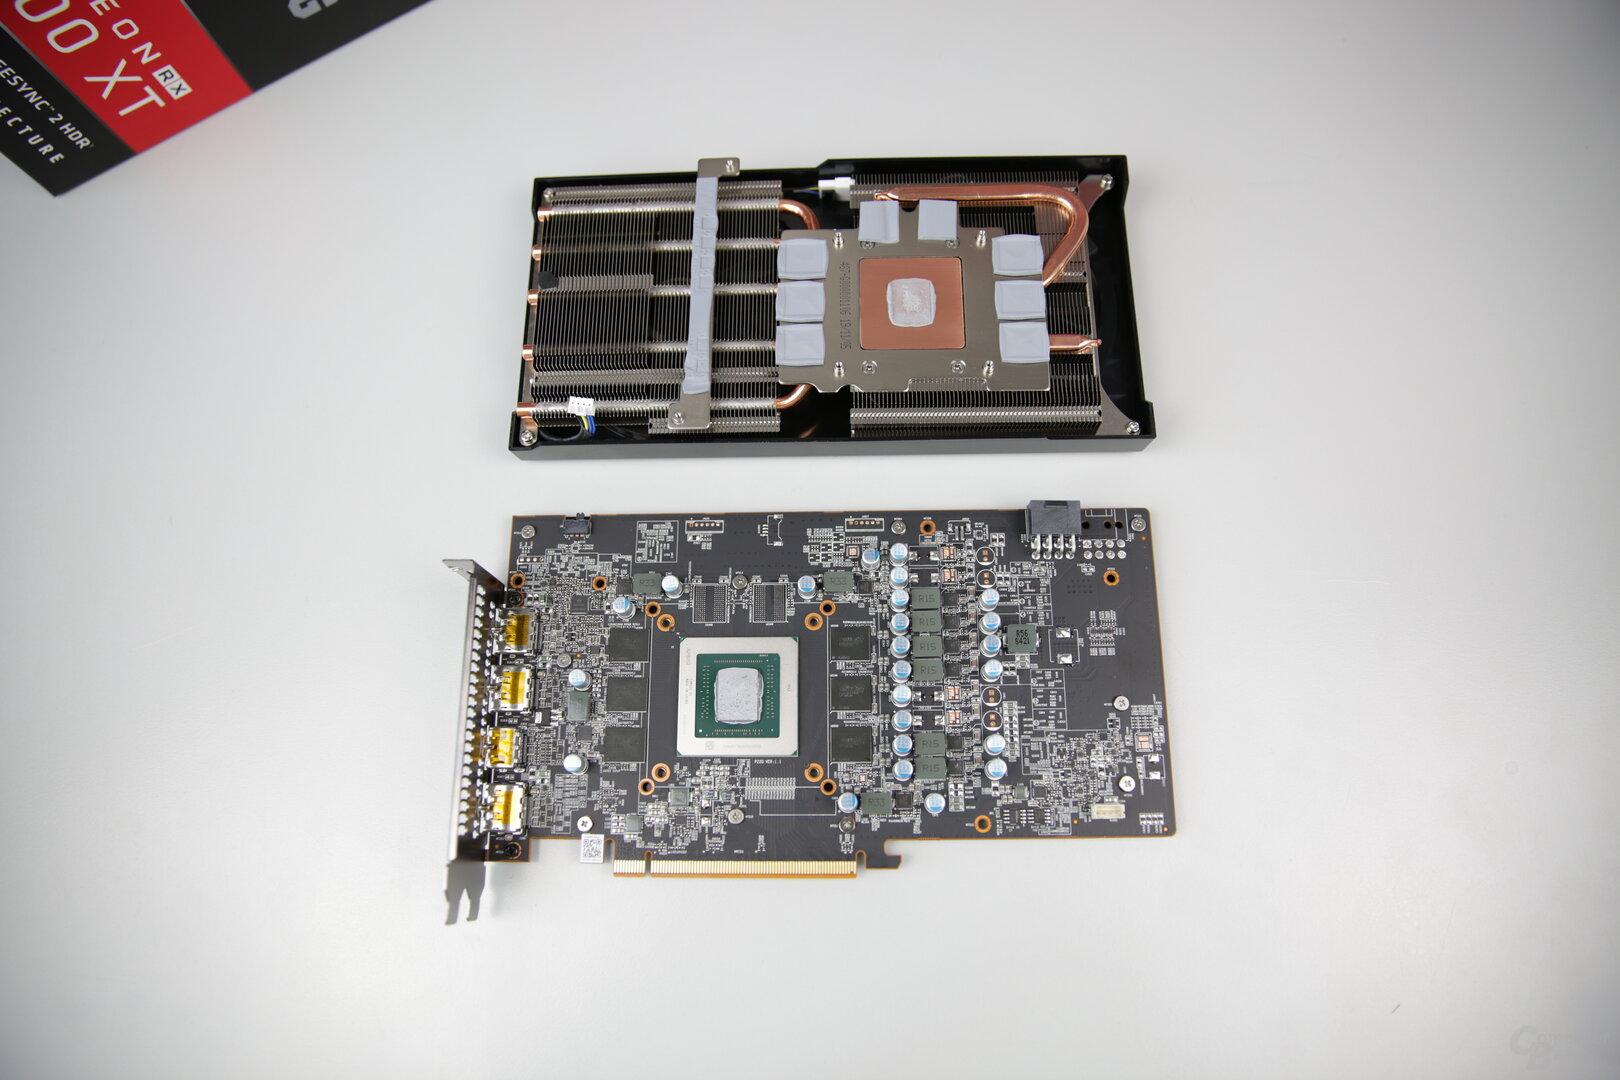 PCB und Kühler der PowerColor Radeon RX 5600 XT Red Dragon